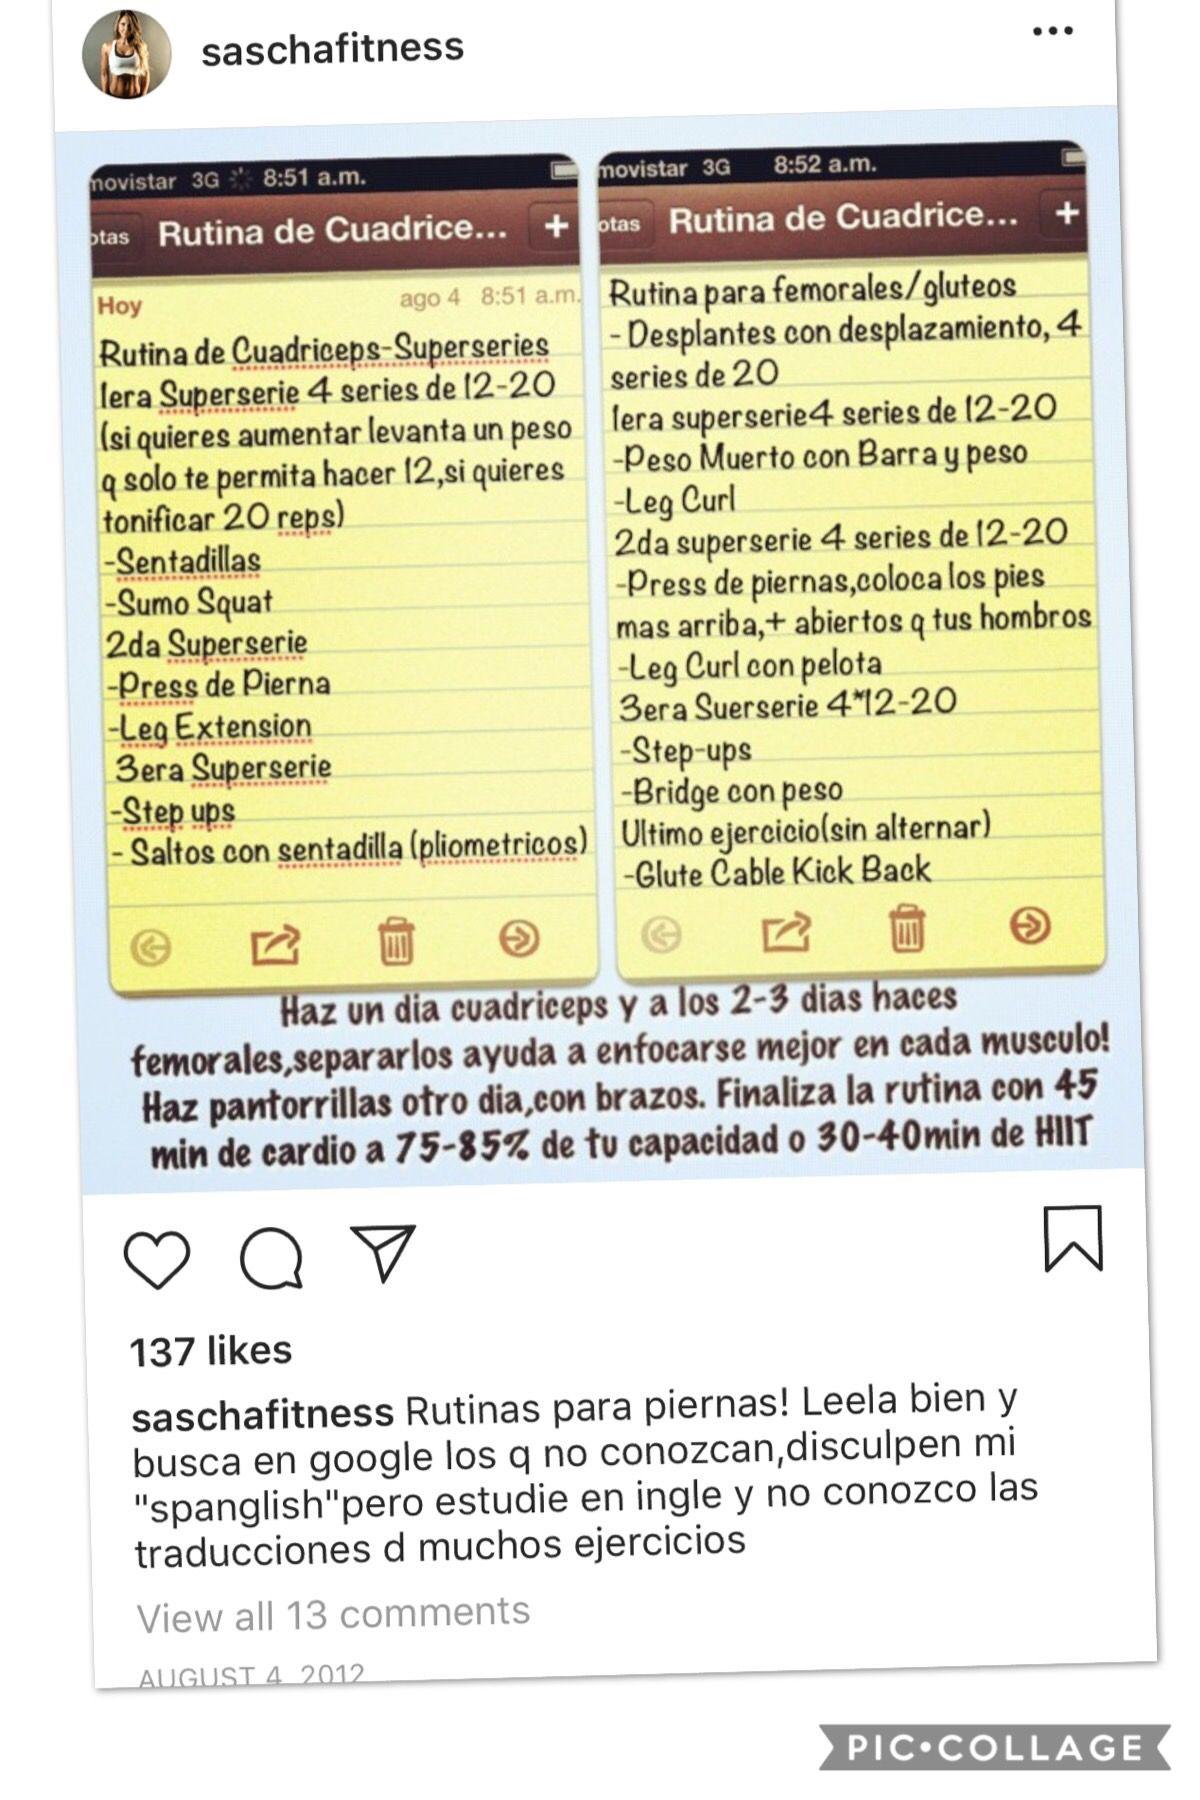 Pin De Azenett Sanchez En Sascha Fitness Tips Recetas Y Mas